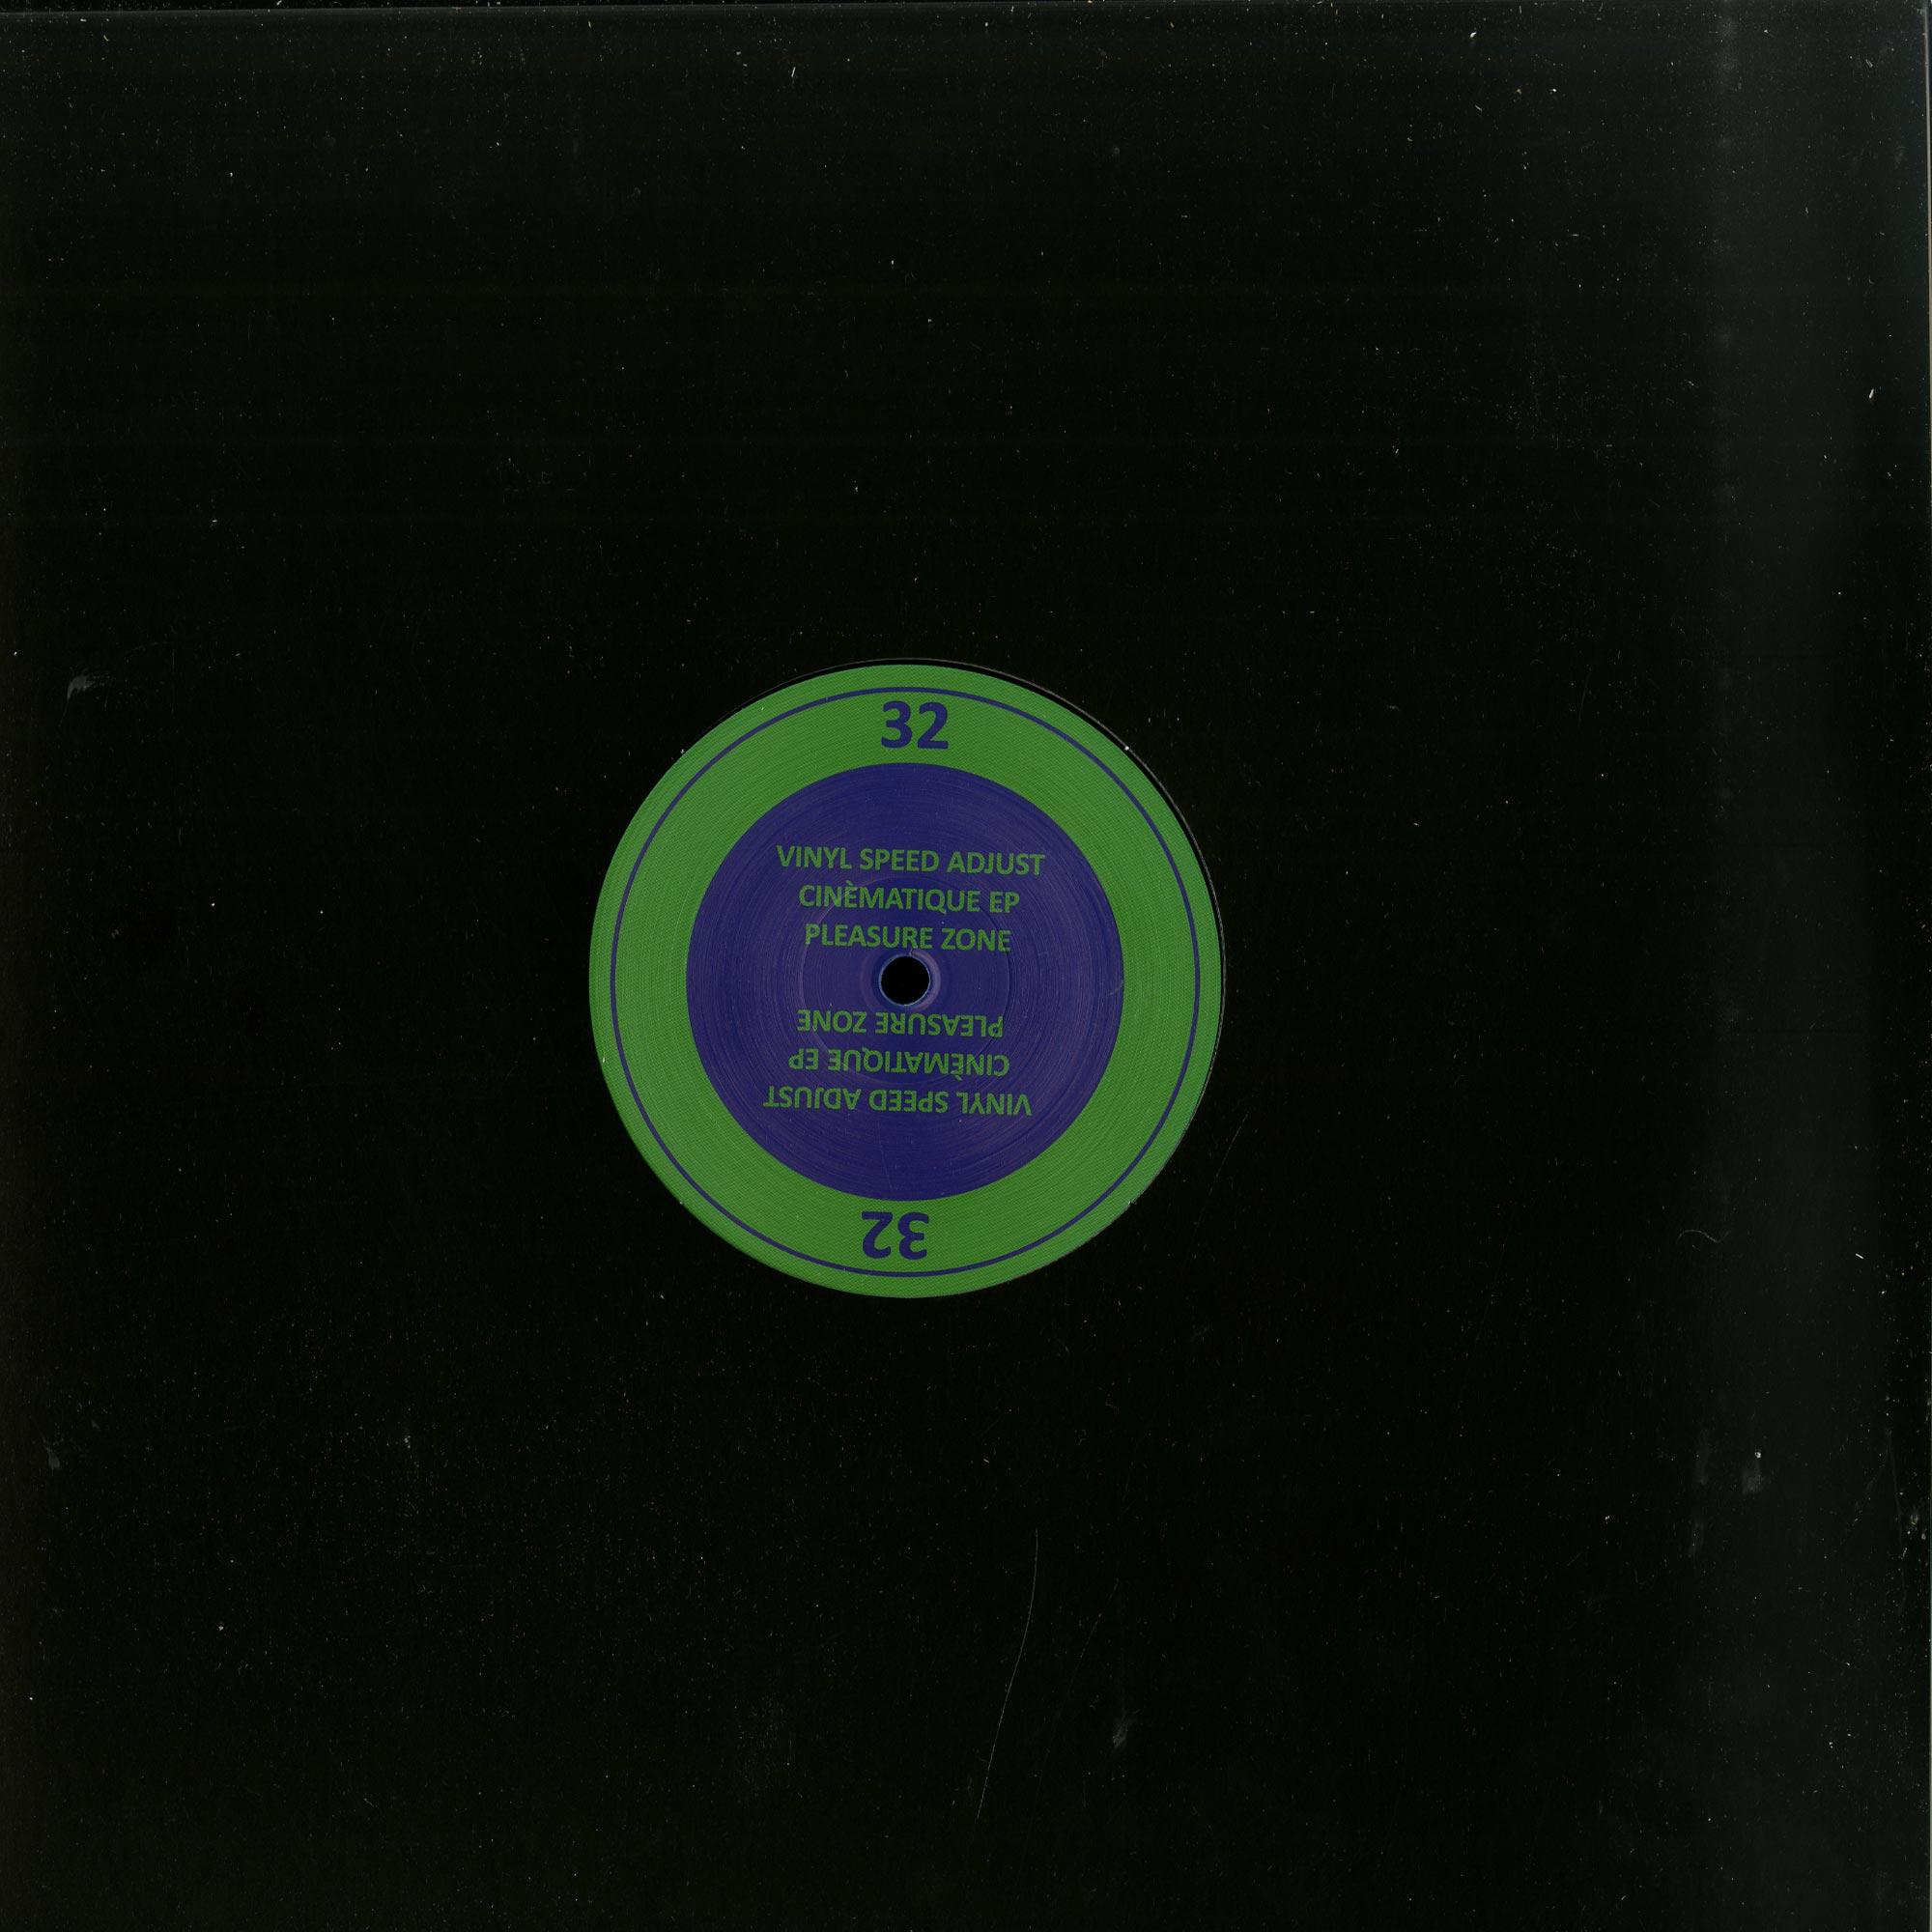 Vinyl Speed Adjust - CINEMATIQUE EP